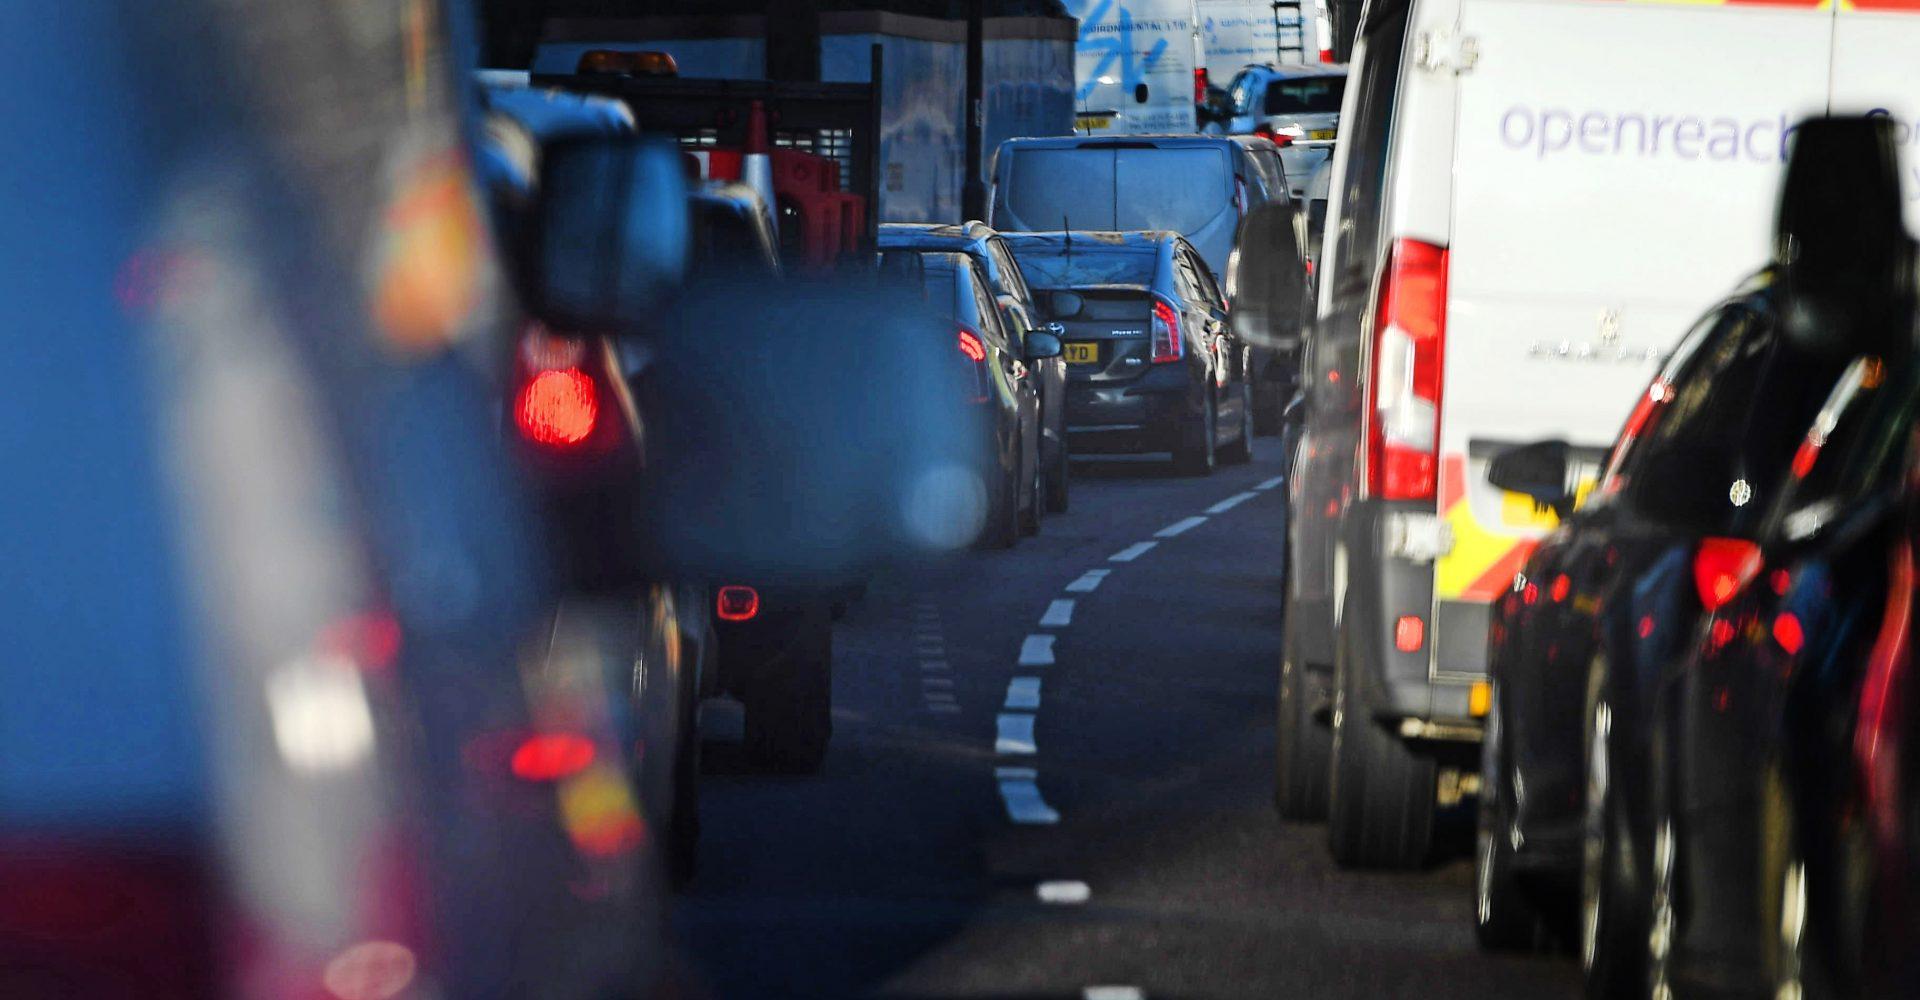 'Concerning' rise in UK traffic despite lockdown rules